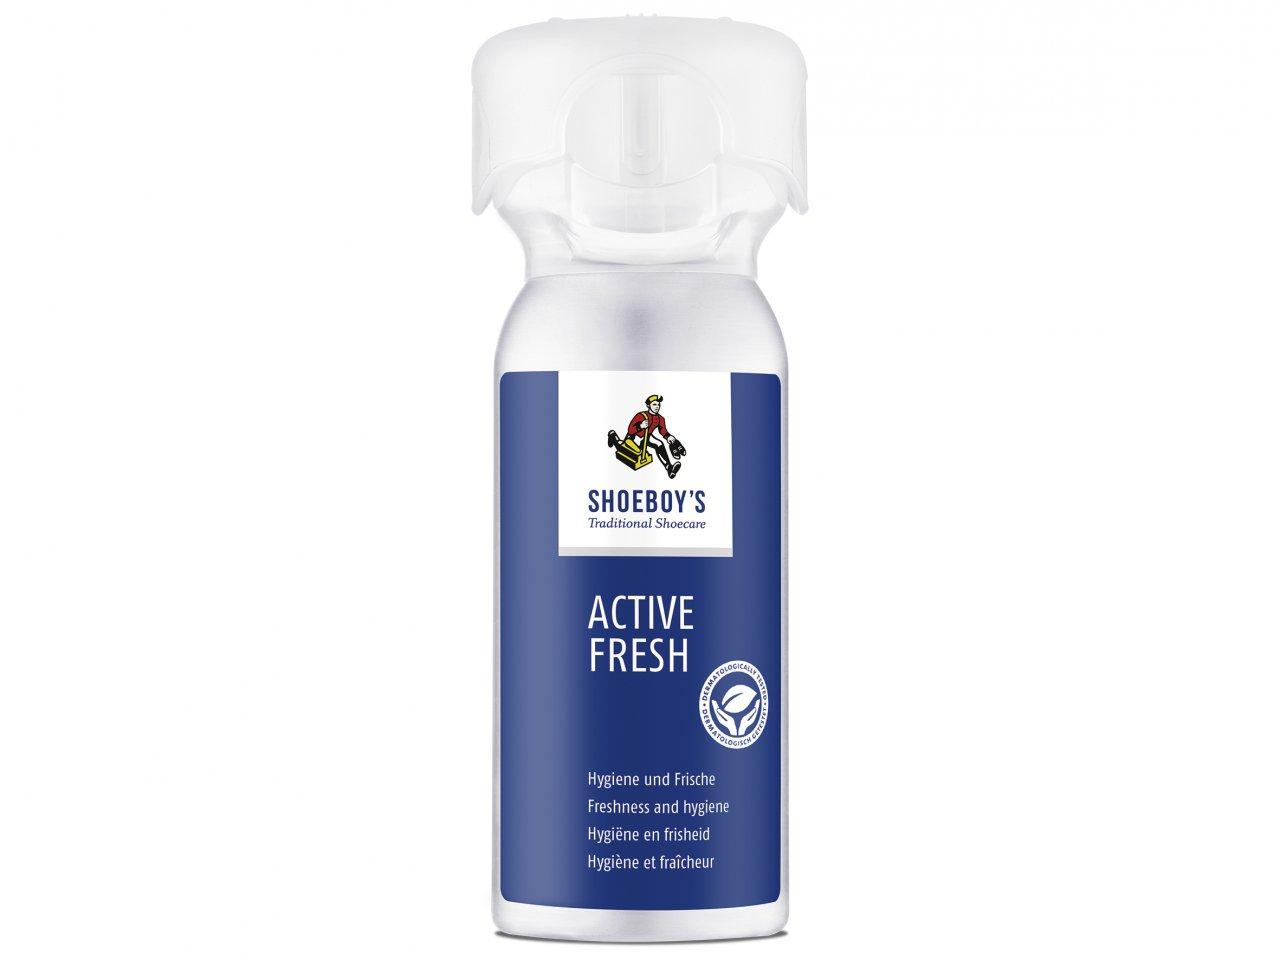 Shoeboy´s Active Fresh